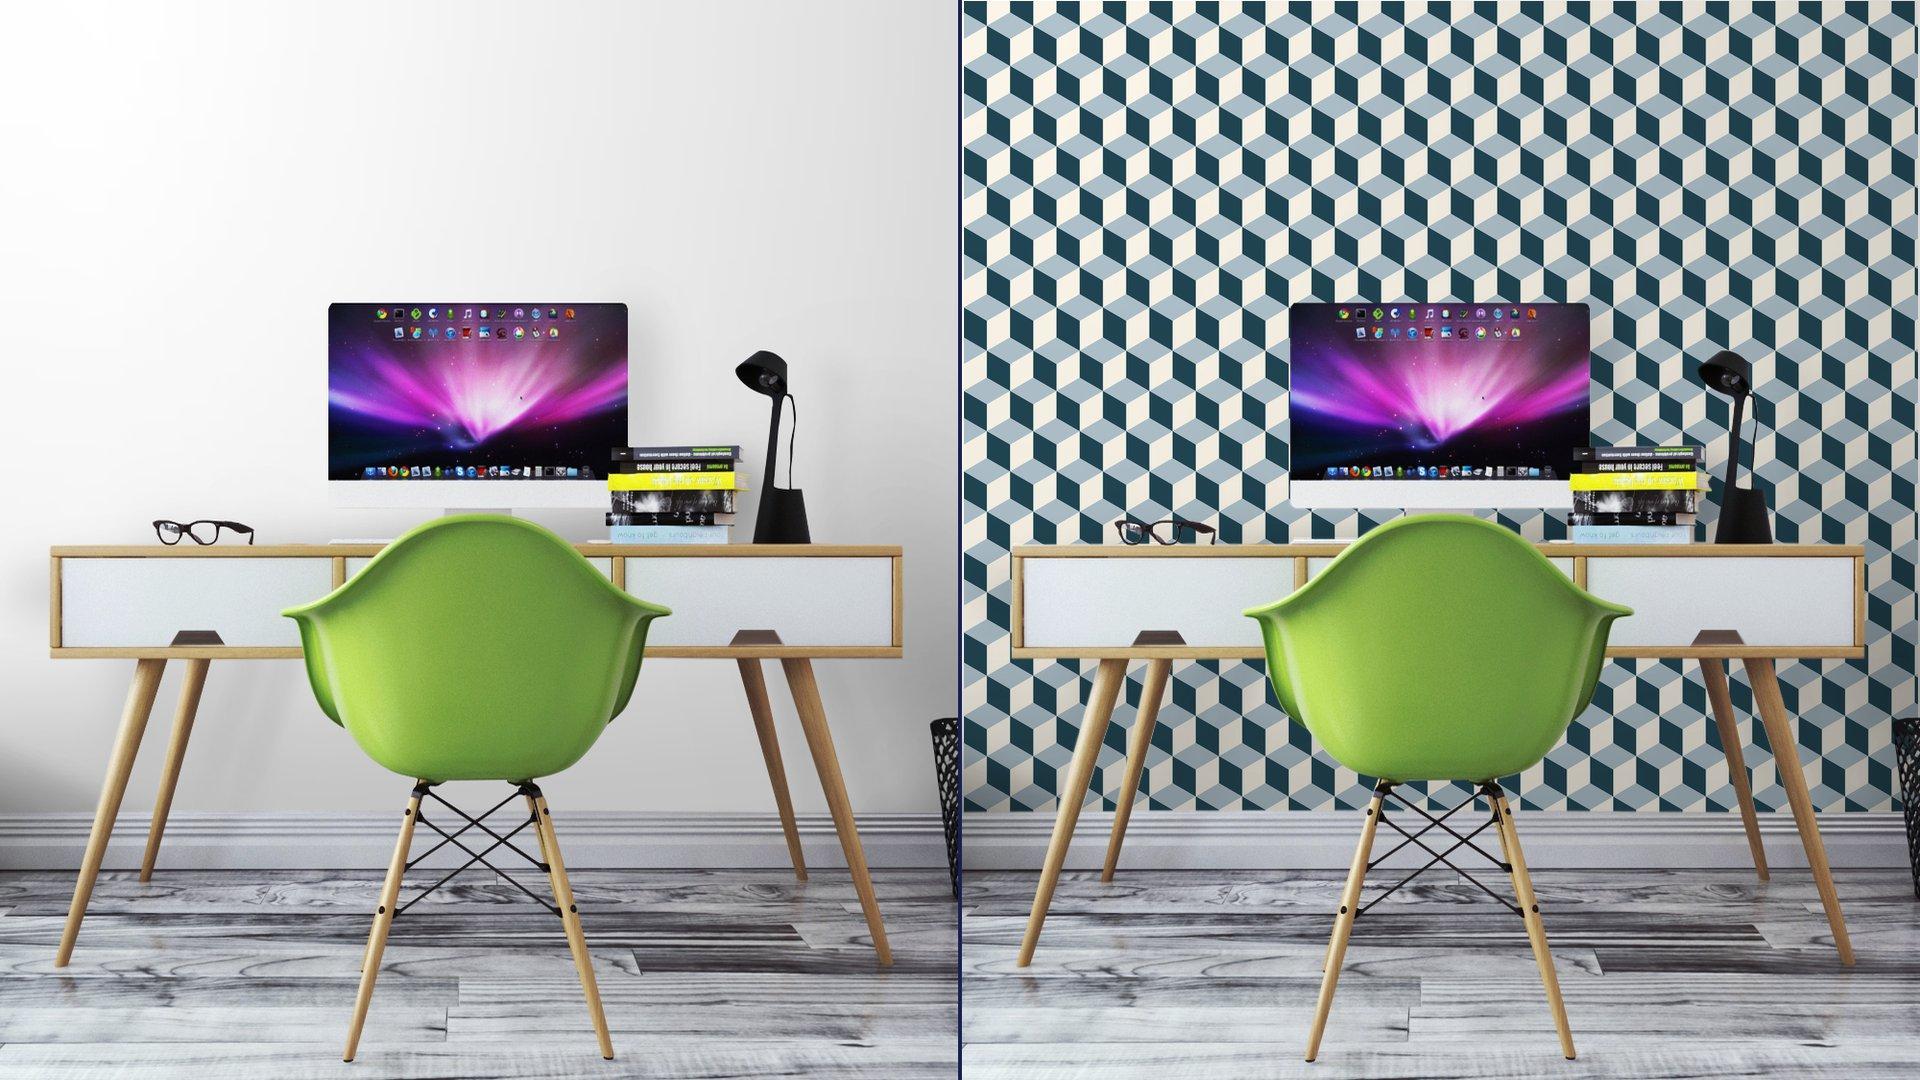 Fotomurales mexico papeles pintados cubos vendimia del fondo 3d patron vector patron de retro 5 - Papel Tapiz Patrón de Cubos 3D 01